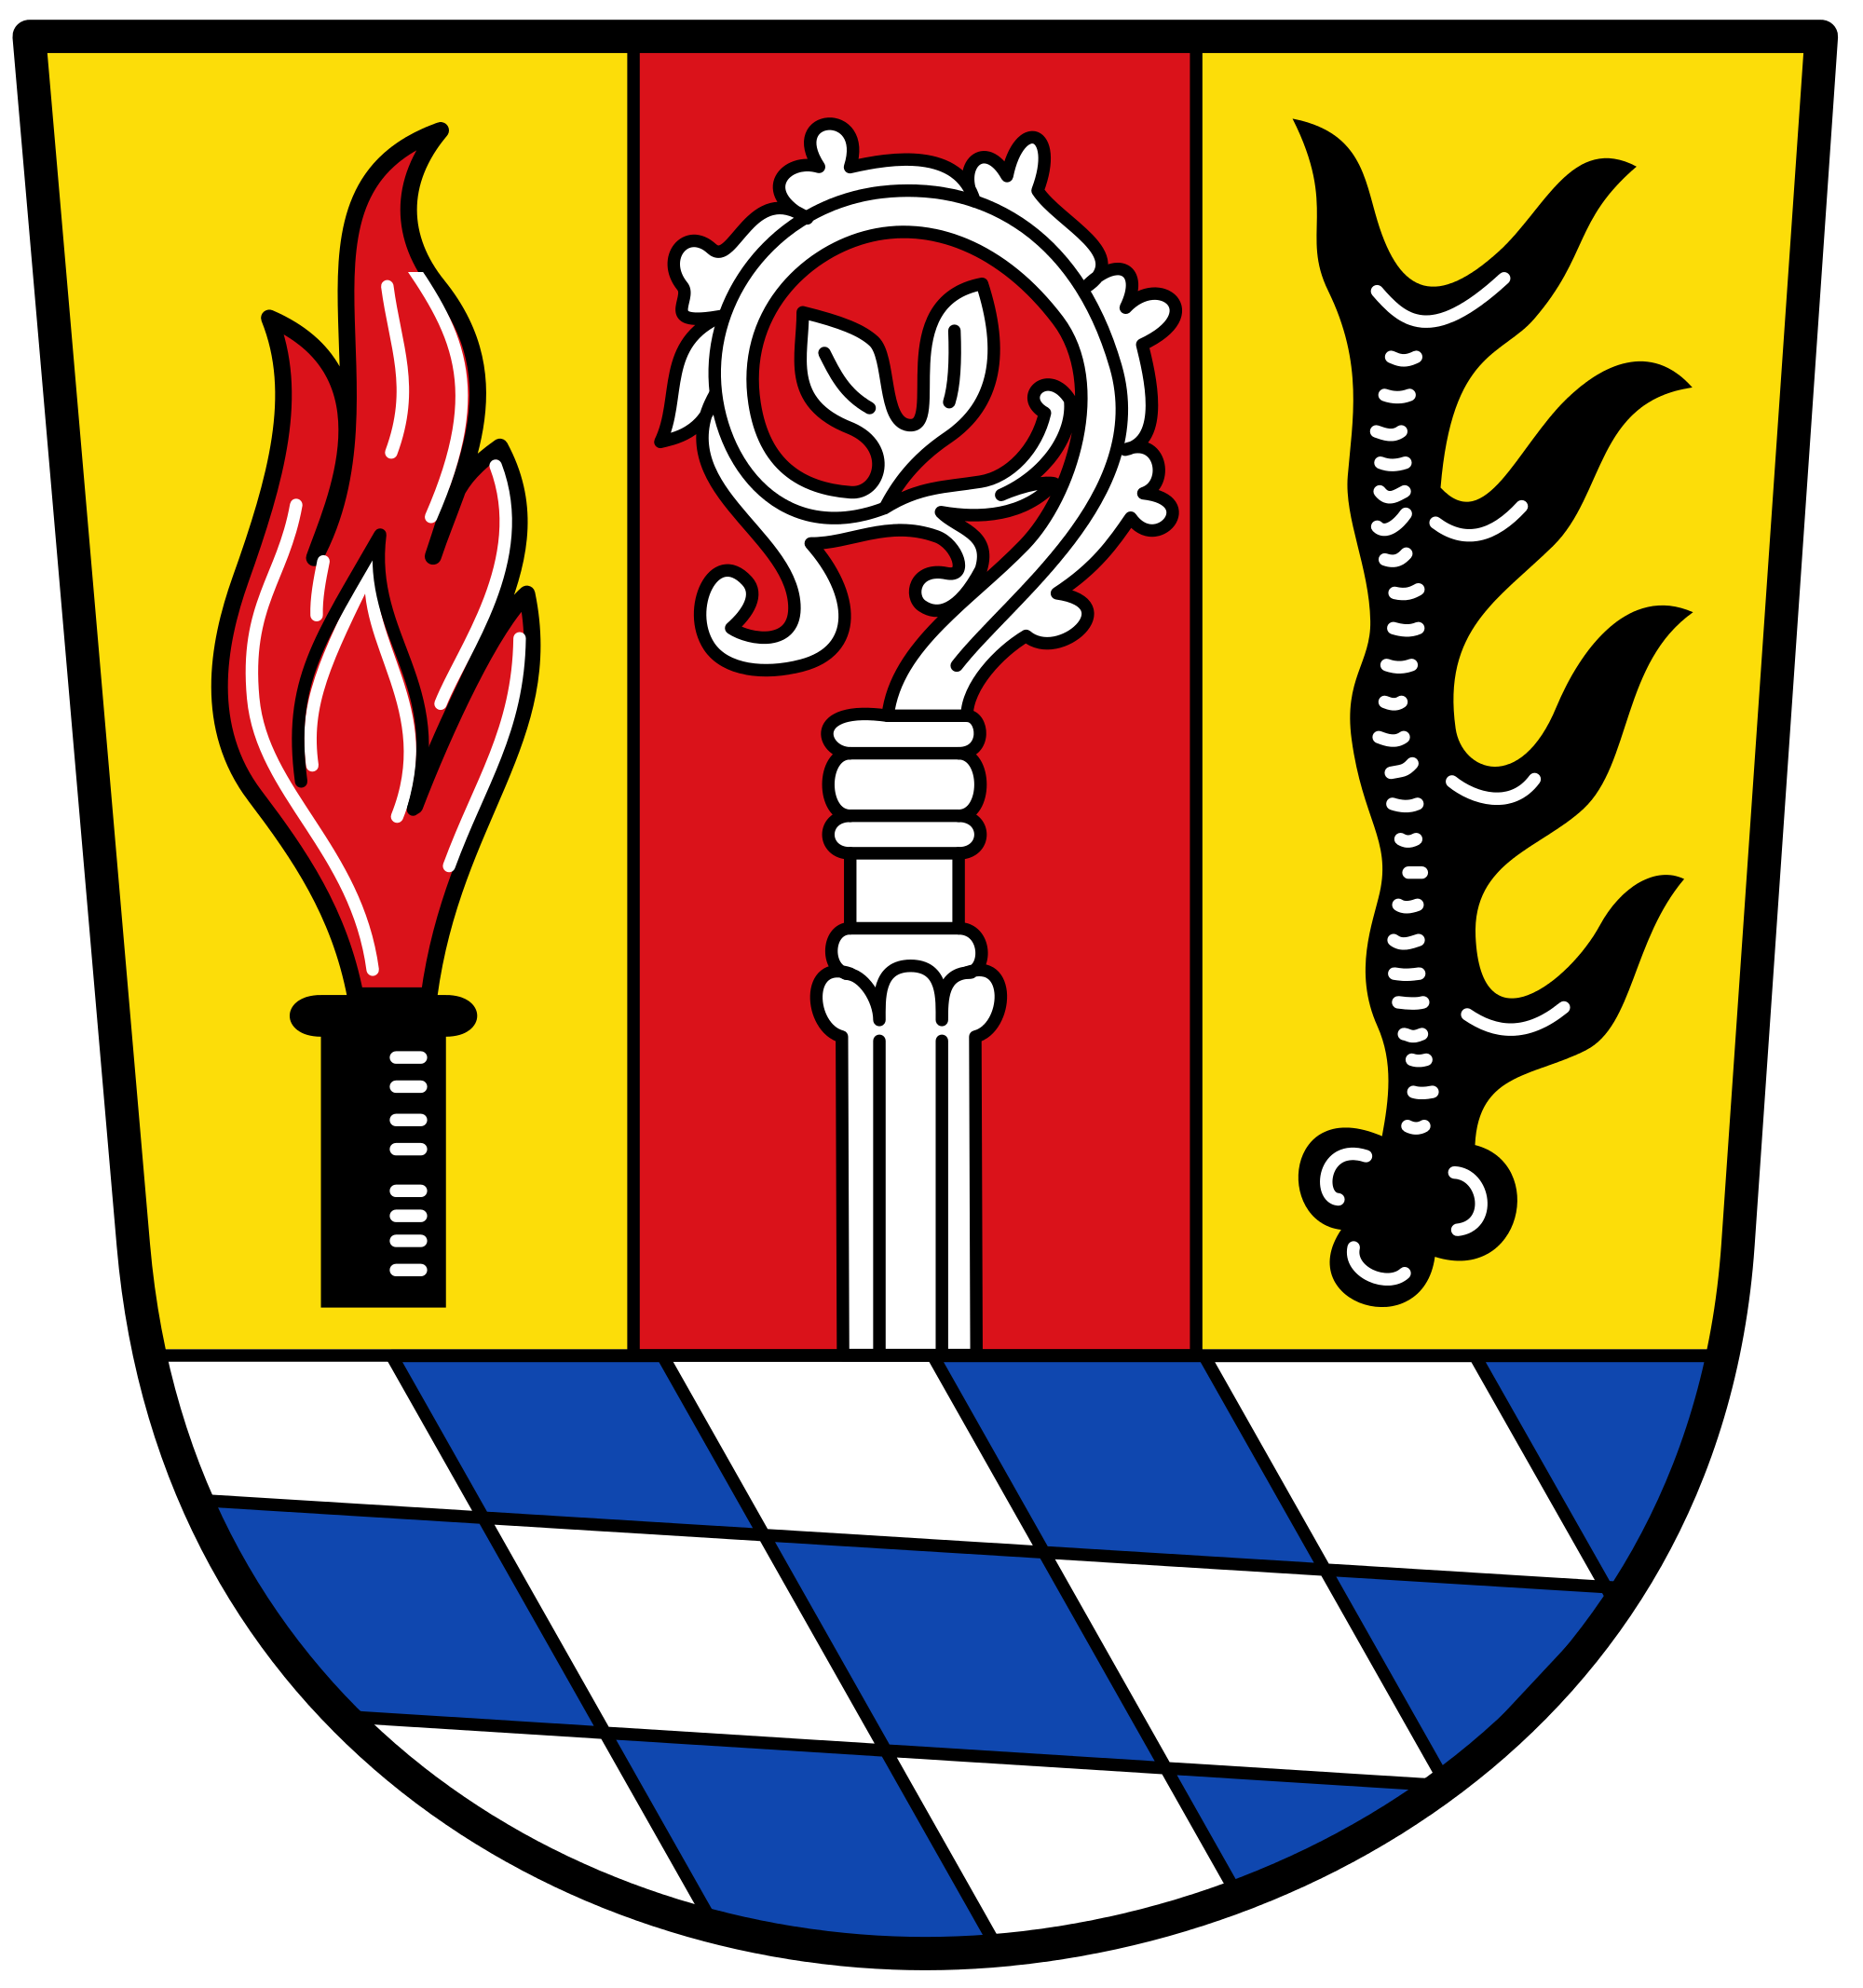 File:DEU Landkreis Eichstätt COA.svg.